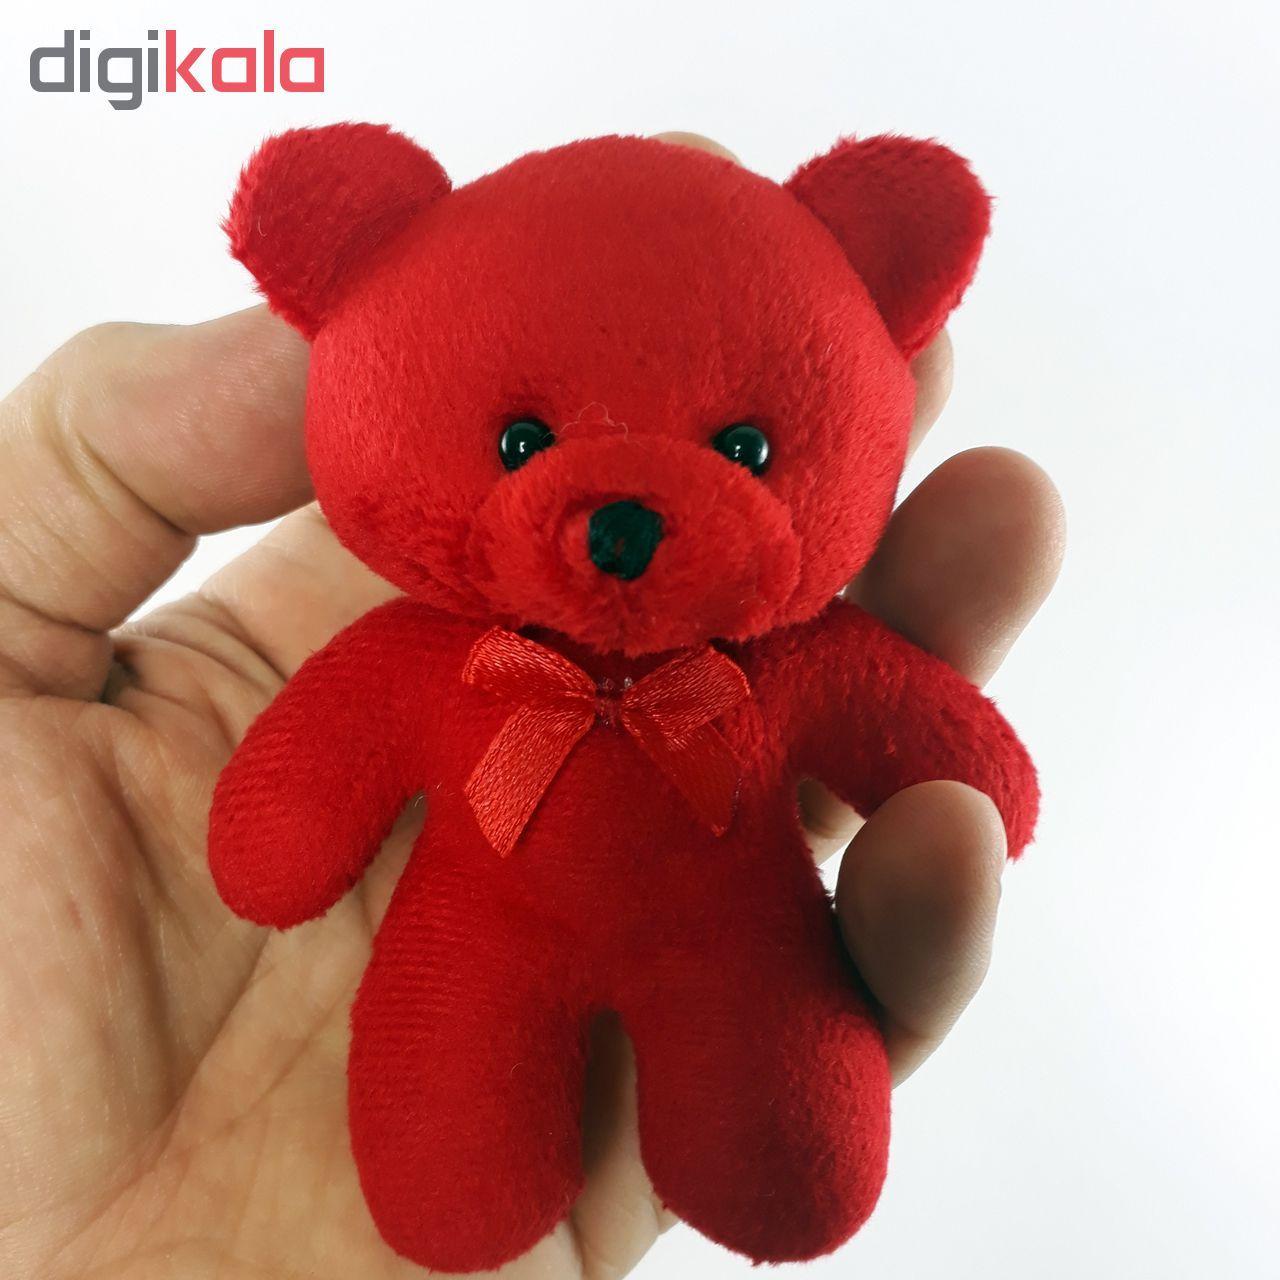 عروسک طرح خرس ارتفاع 12 سانتیمتر main 1 1